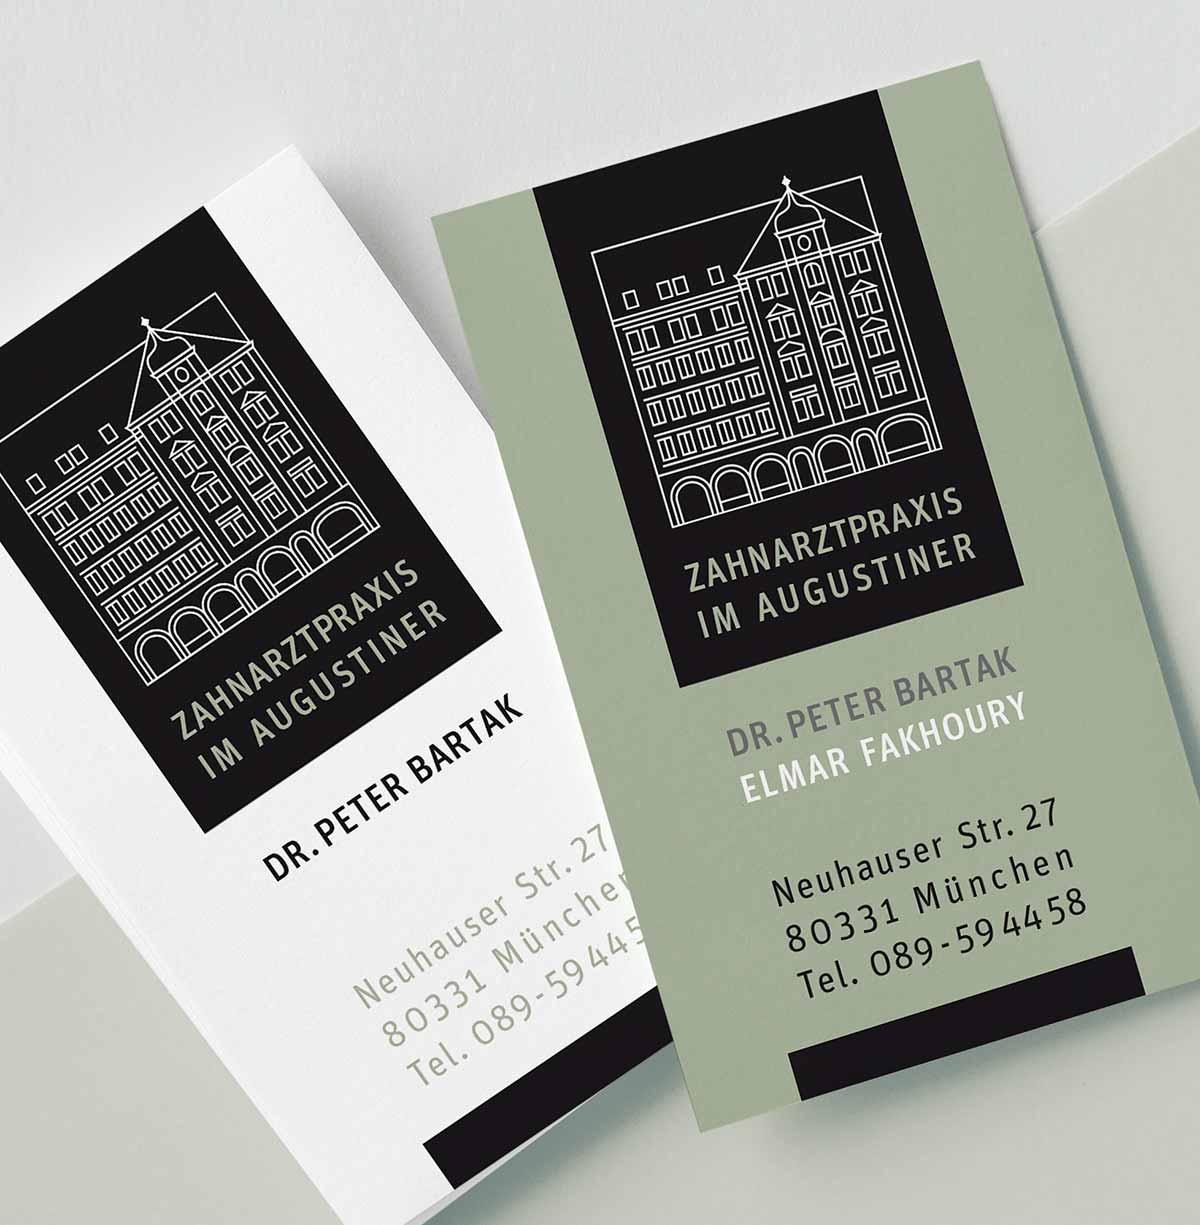 c-c-design.de - Grafik Design - Visitenkartendesign - Businesscard für Dr. Peter Bartak